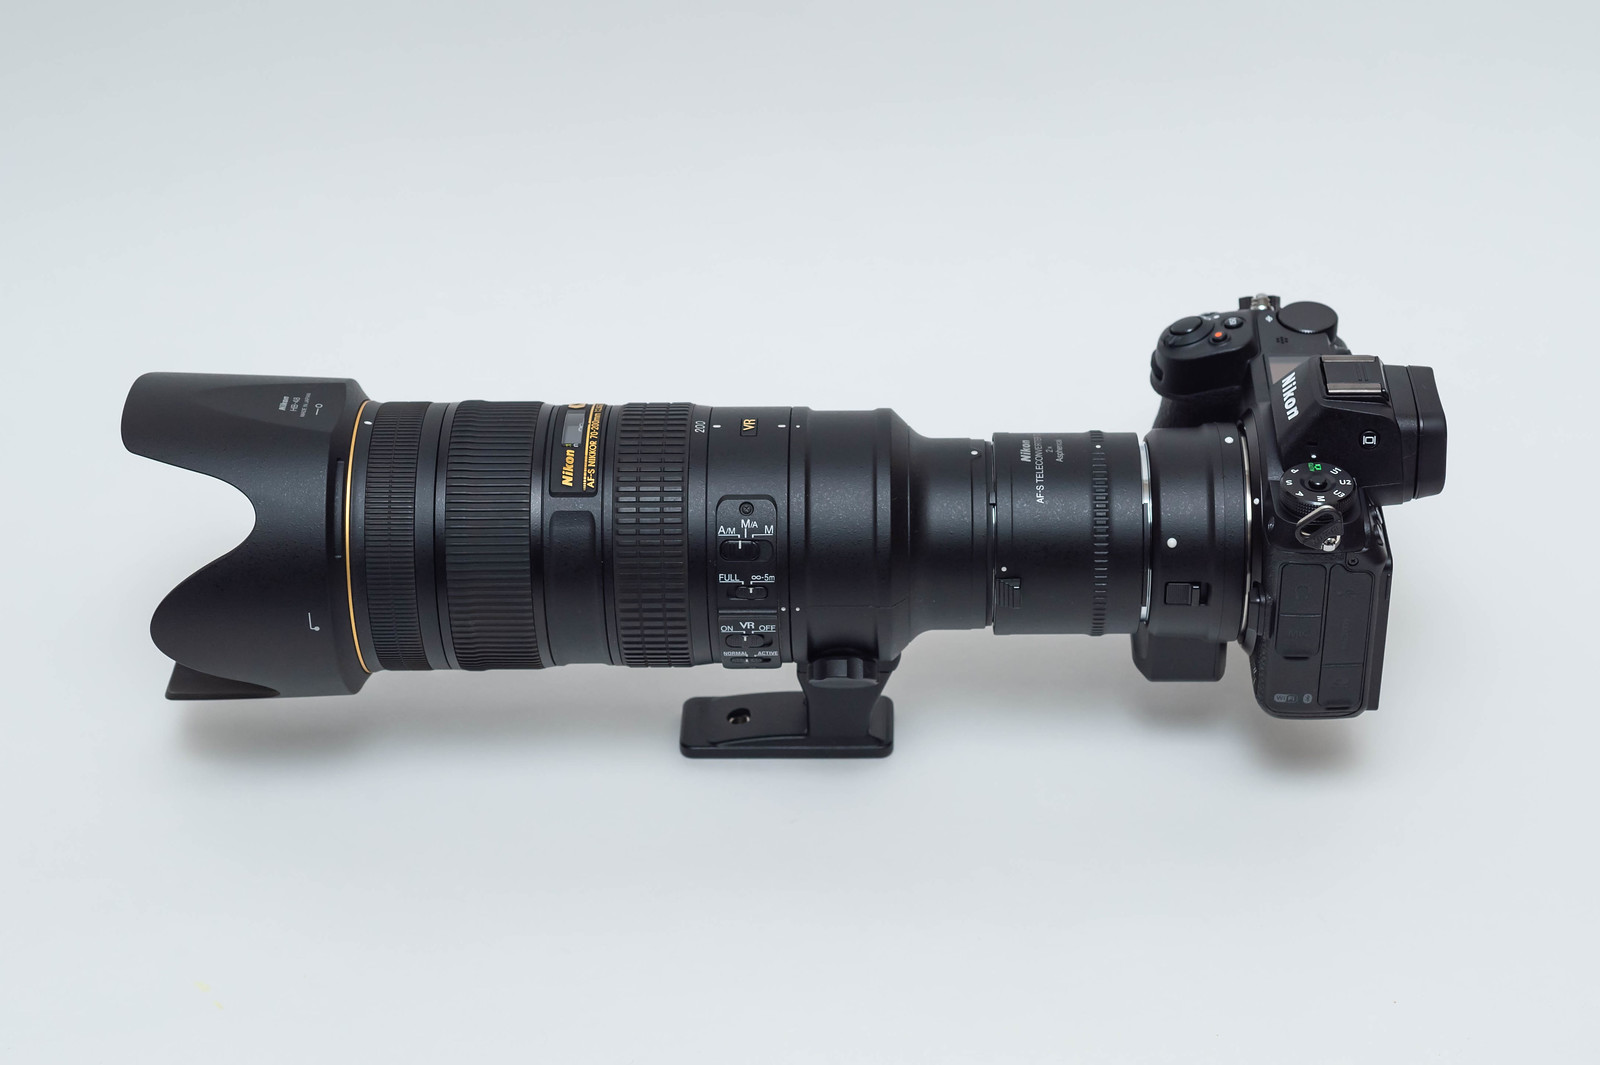 Nikon Z7 + FTZ + TC-20E III + AF-S NIKKOR 70-200mm f/2.8G ED VR II